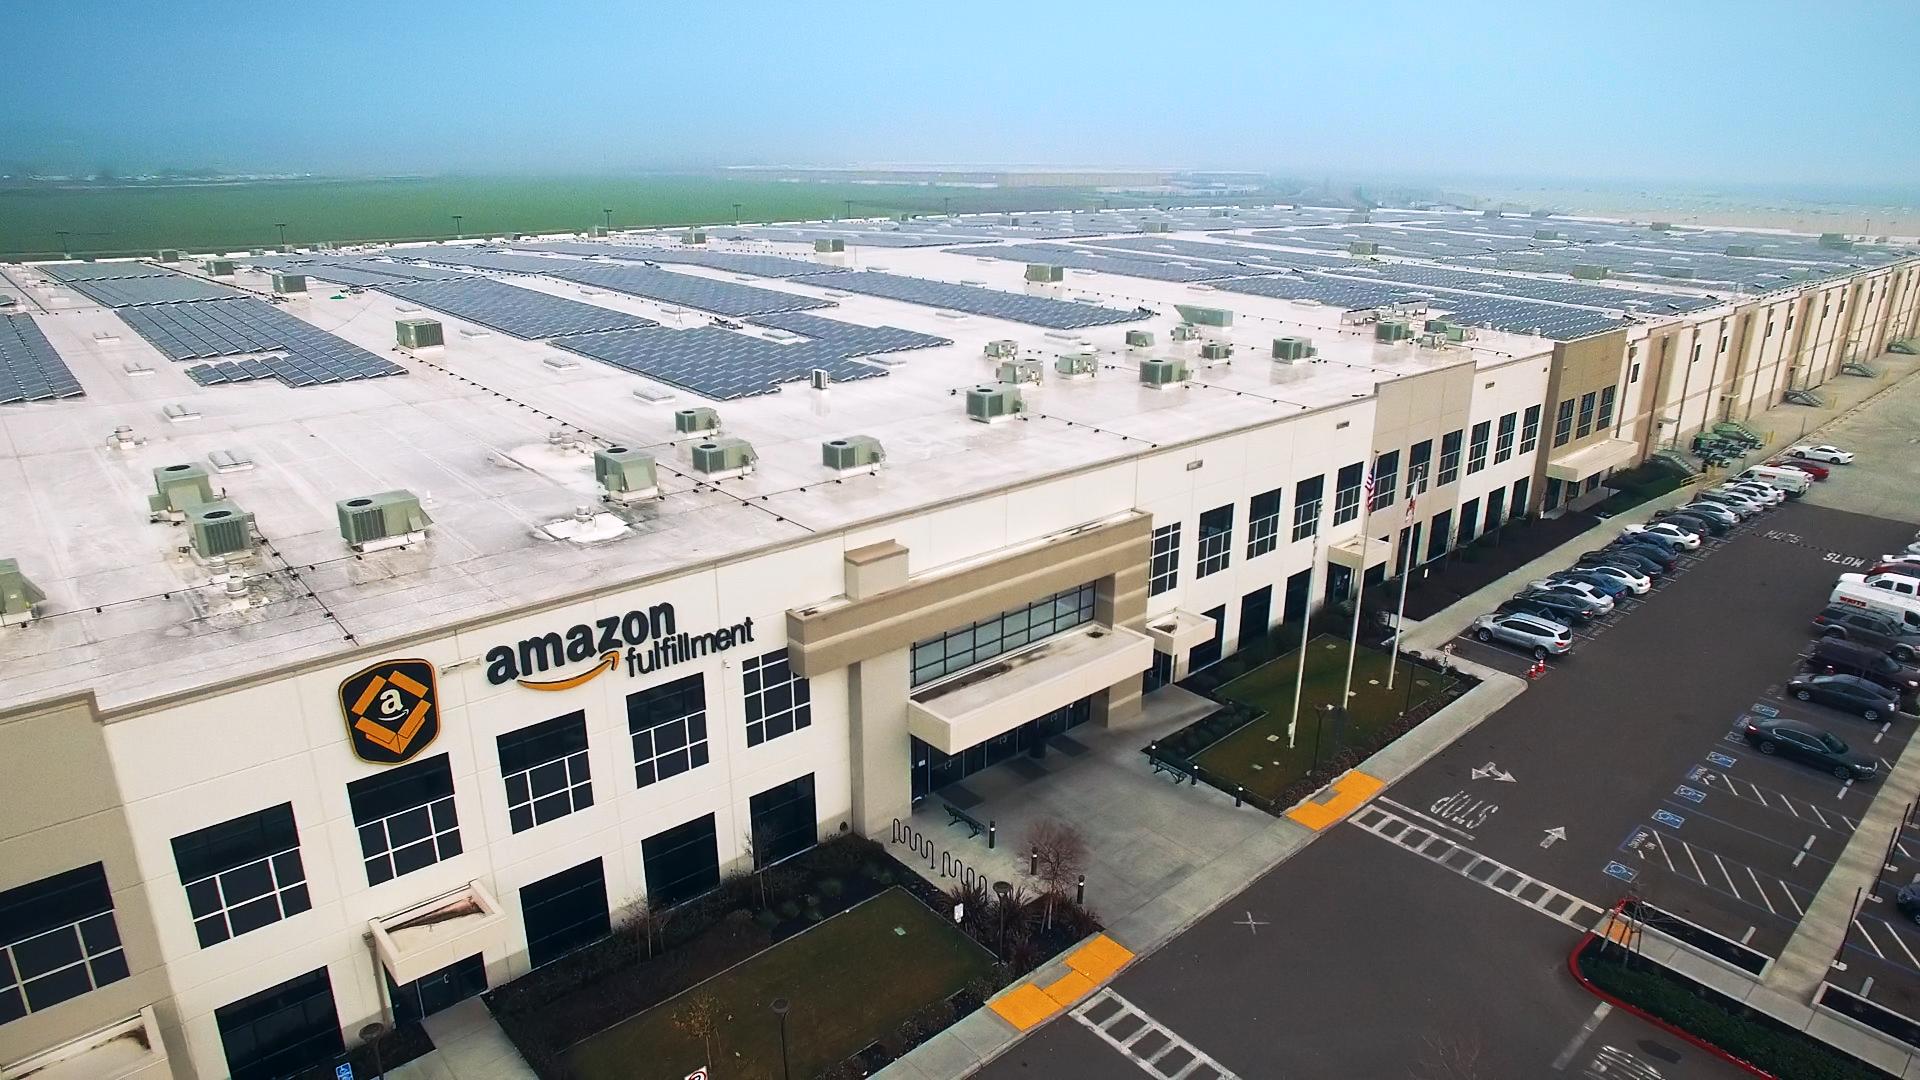 Aerial shot of an Amazon fulfillment center.